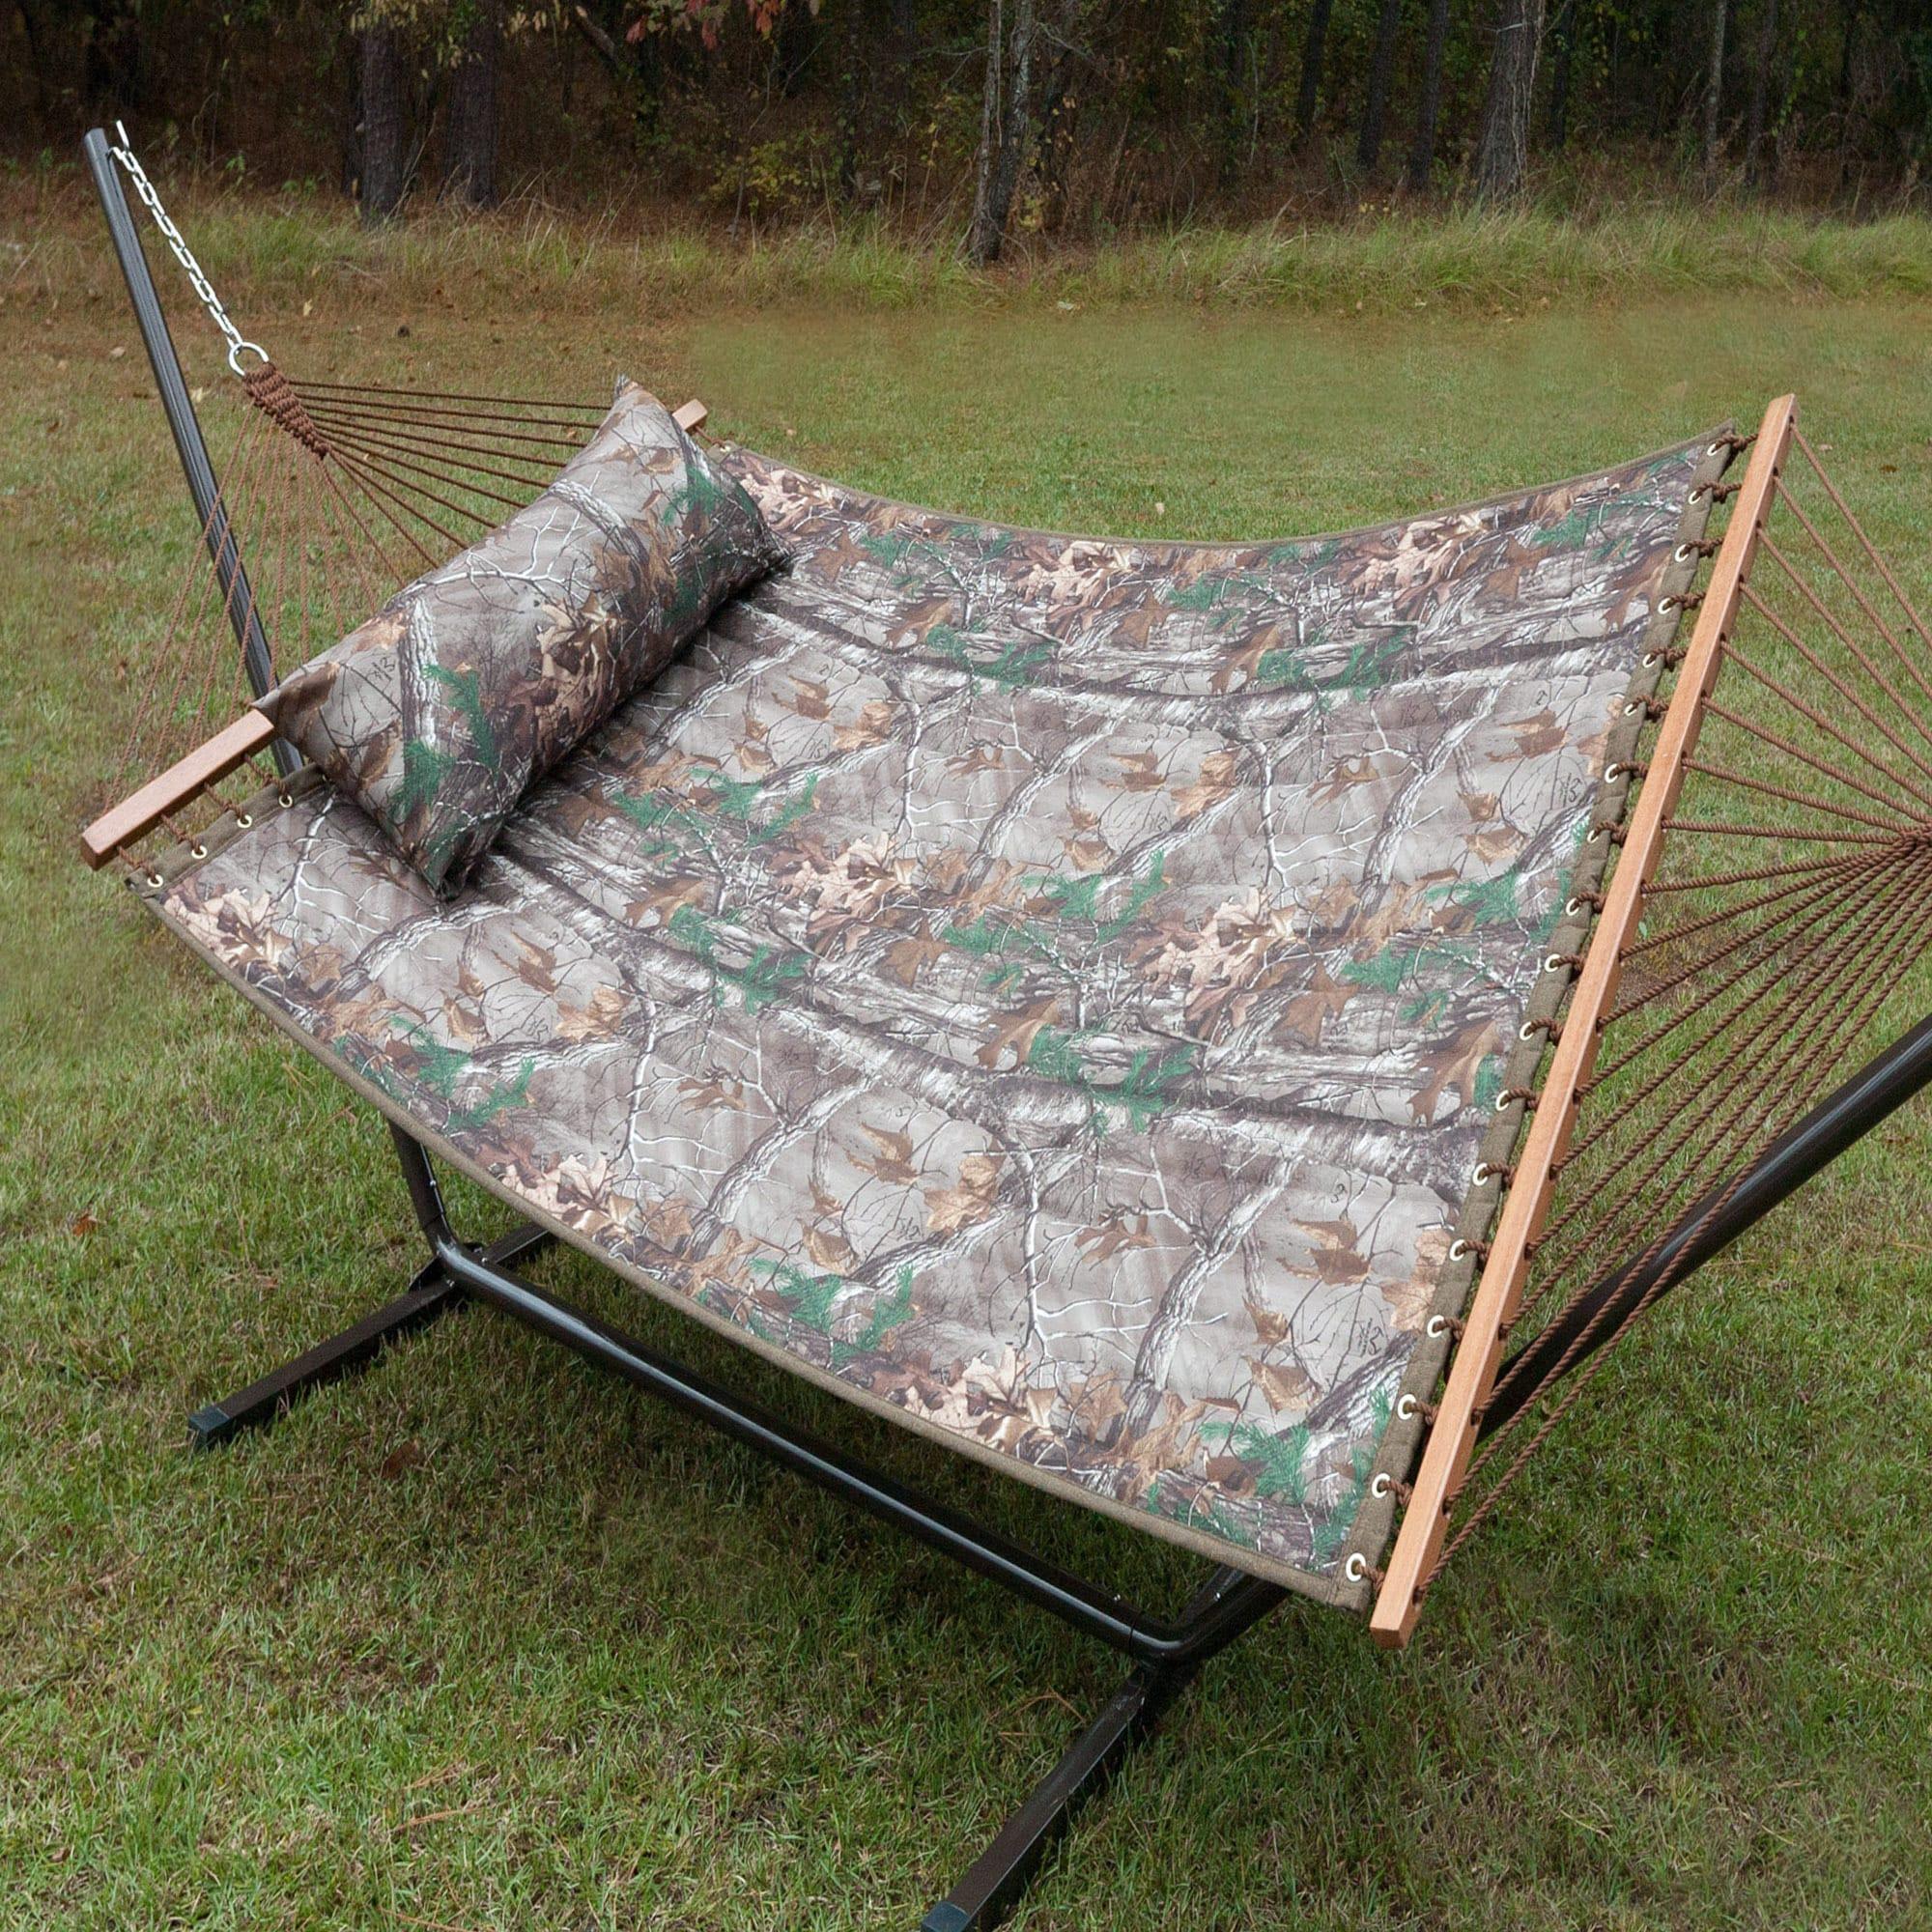 free alone shop swing outdoor hammock sorara living session studio stand standing